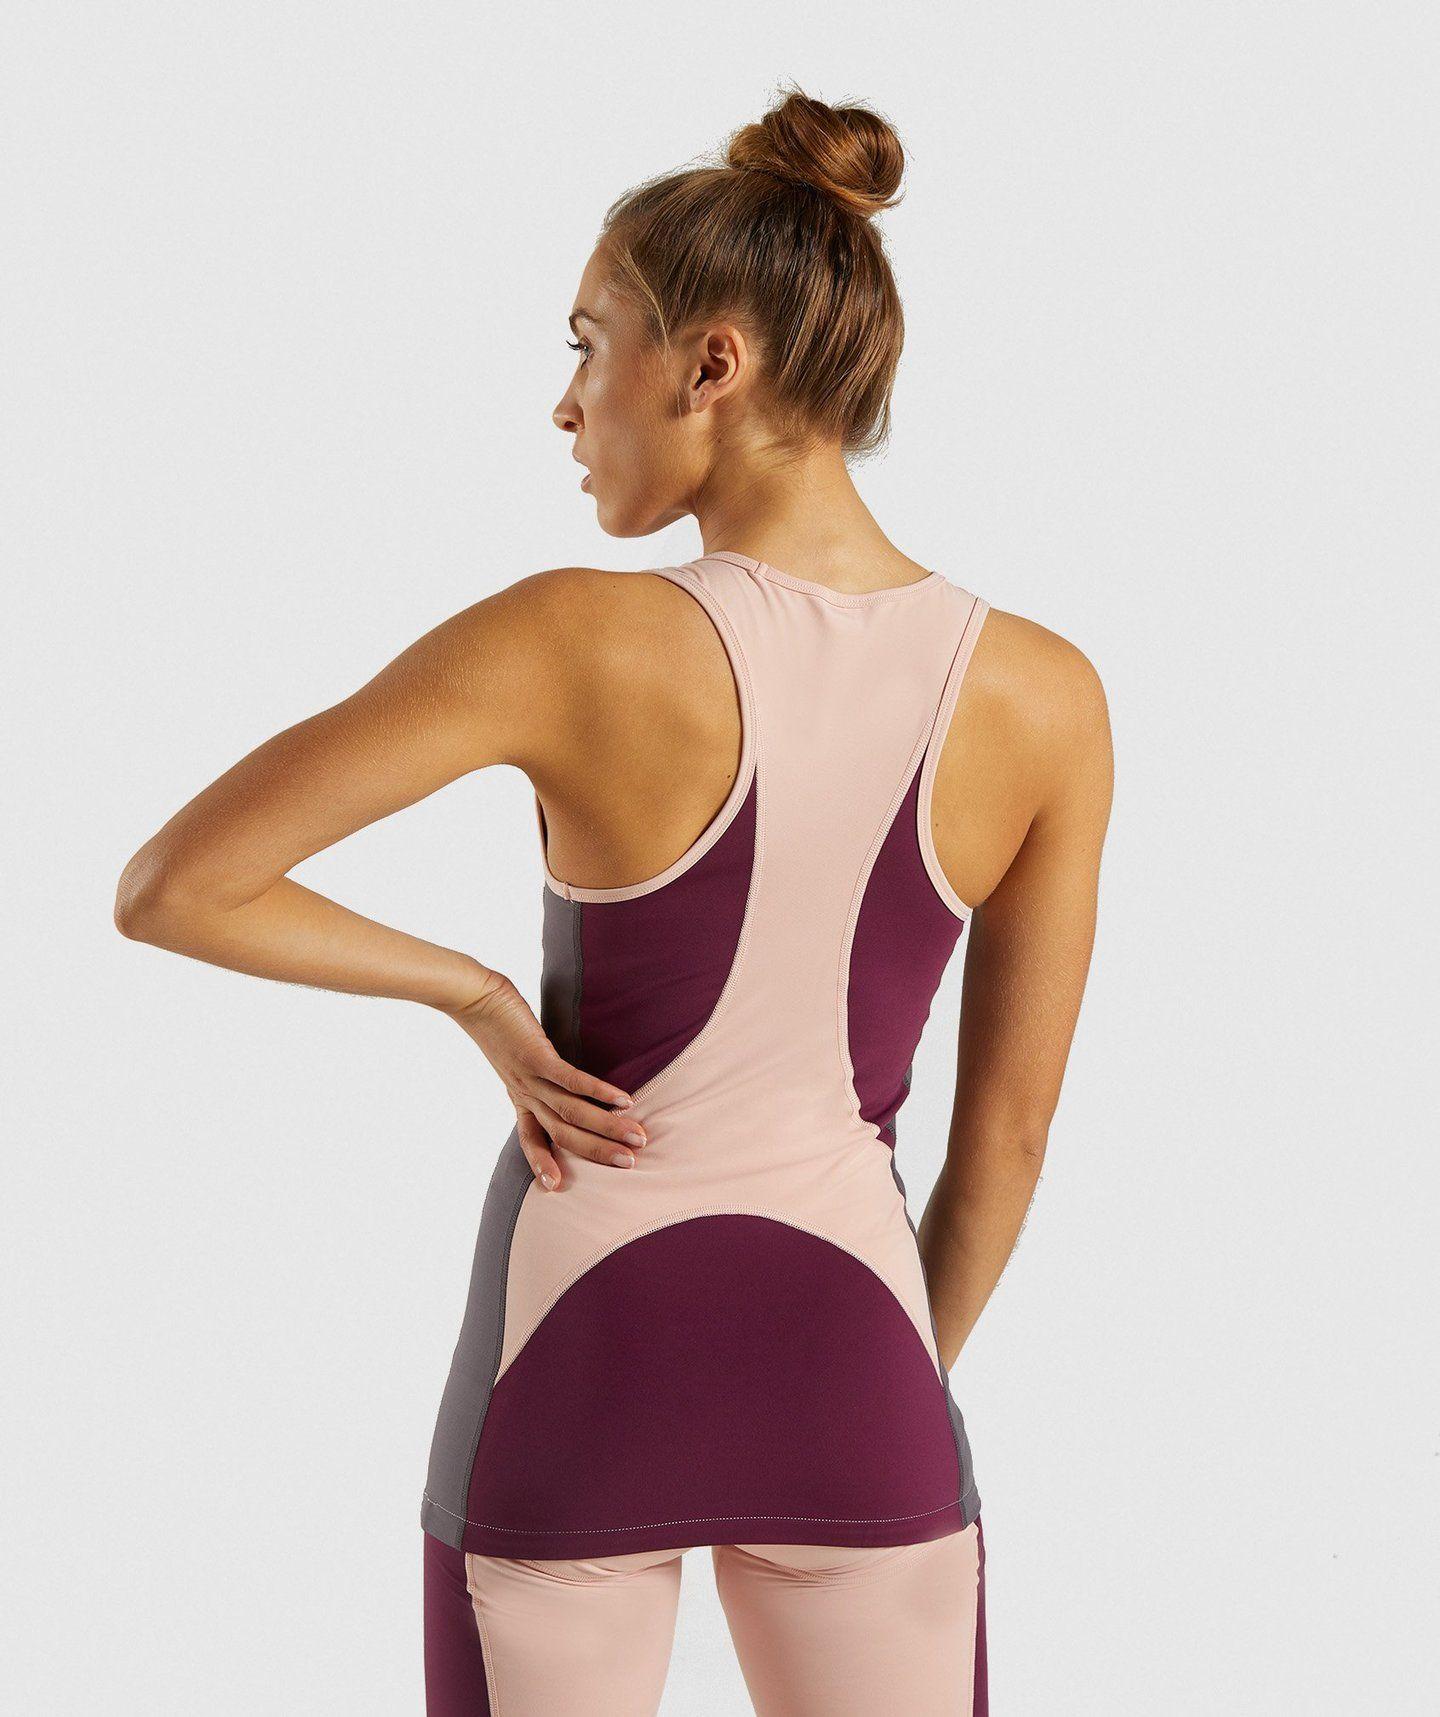 57addc13c0b0a Gymshark Illusion Vest - Dark Ruby Blush Nude Slate Lavender 1 ...